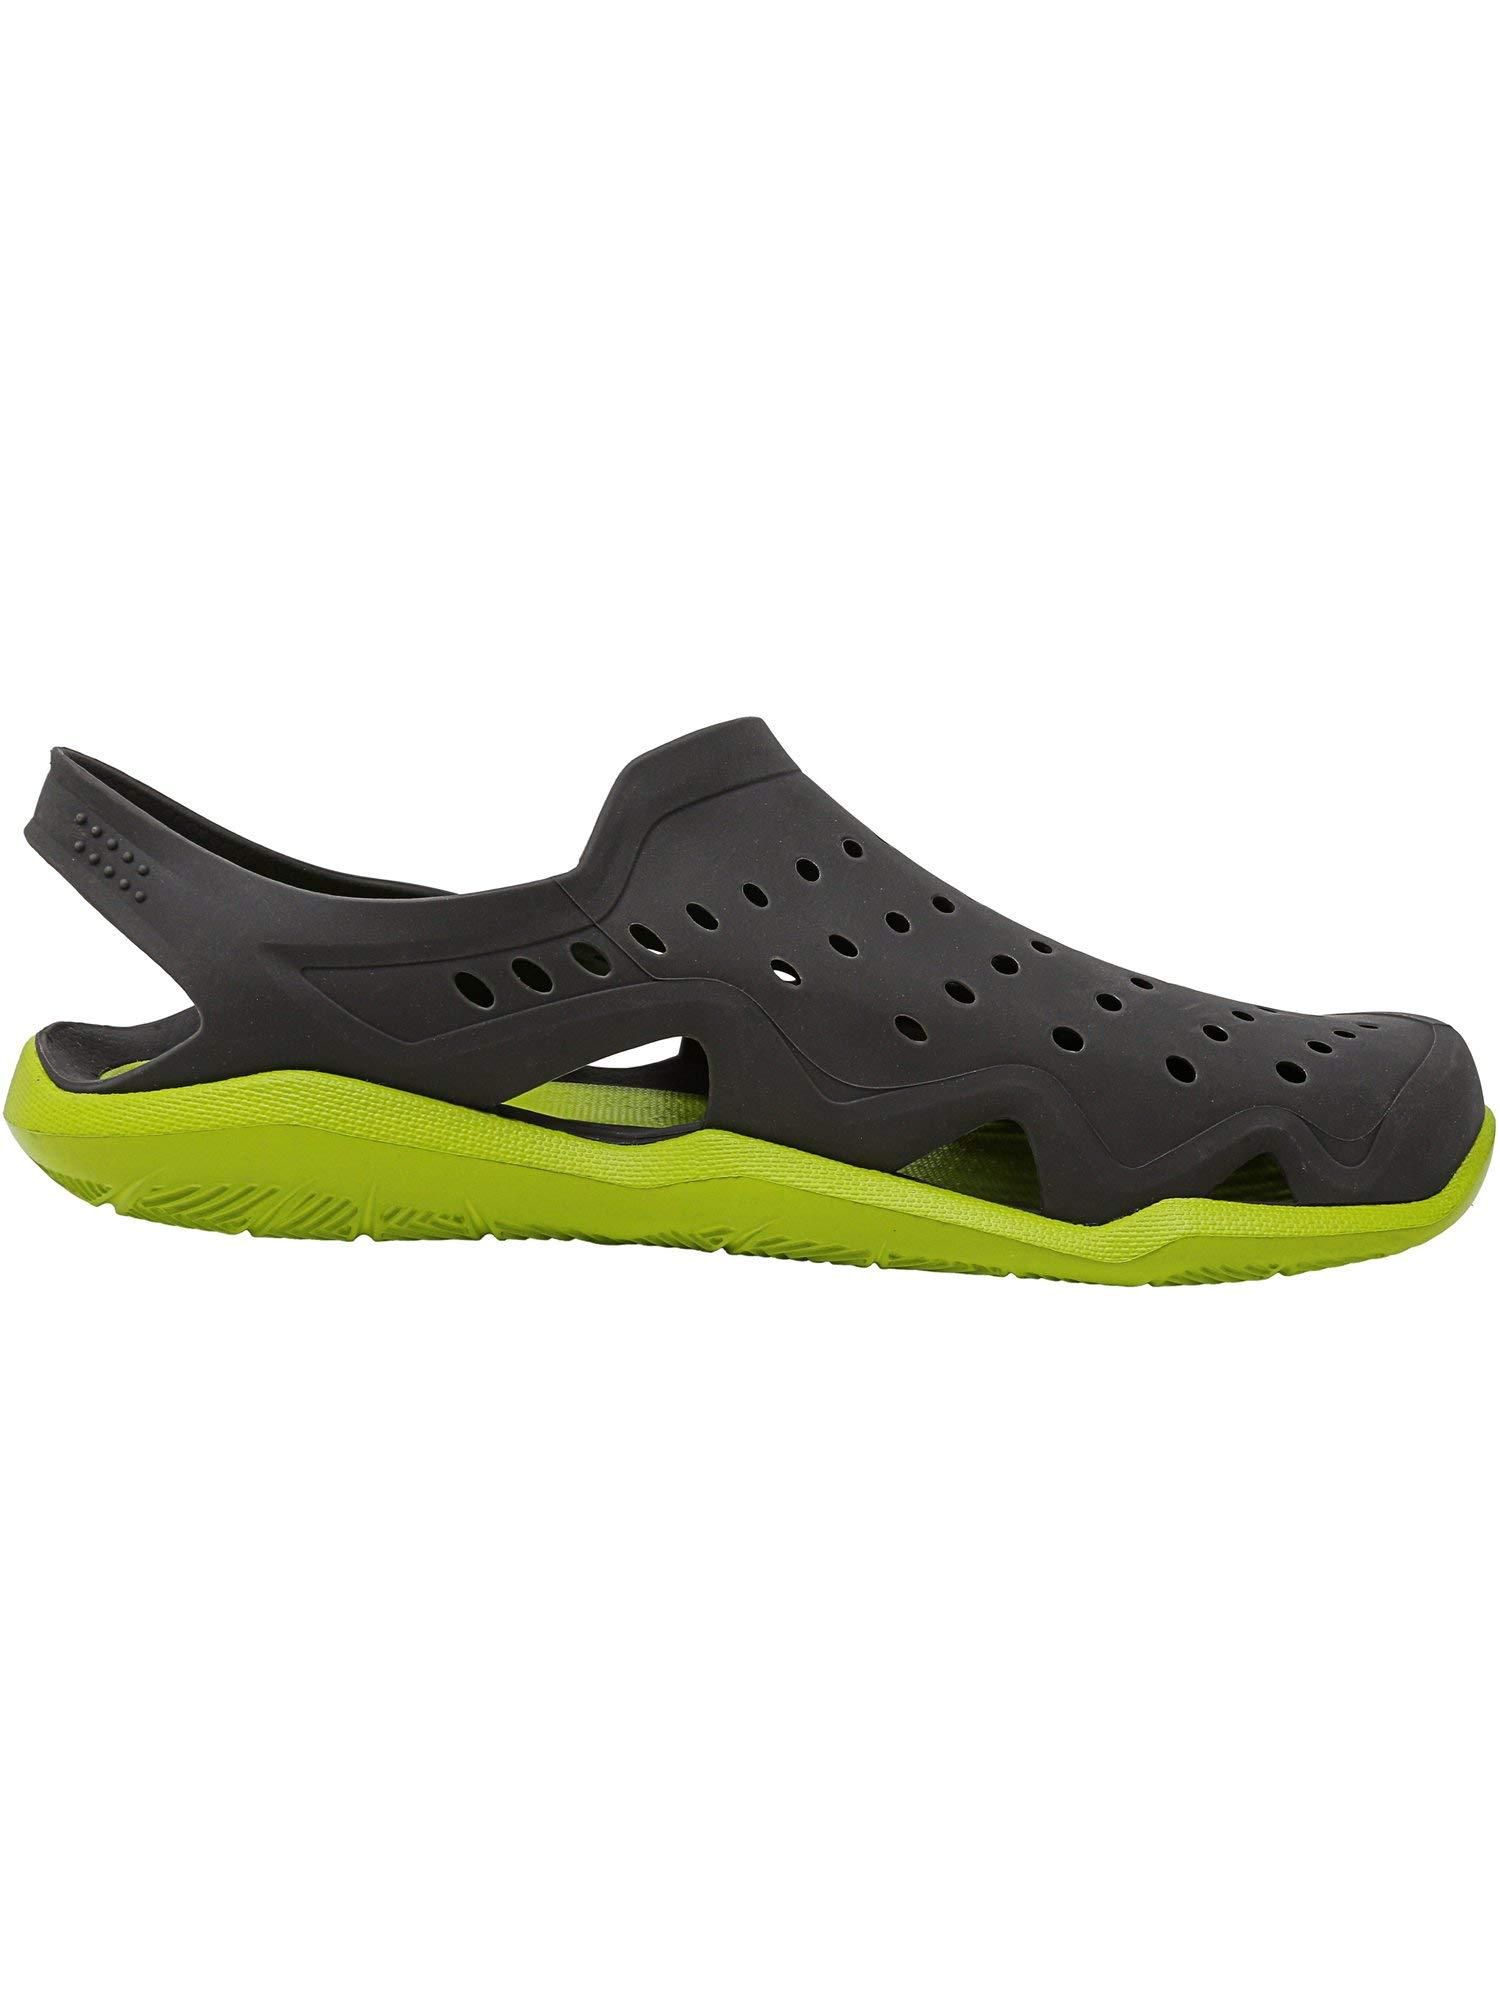 Crocs Men's Swiftwater Wave Graphite/Volt Green Ankle-High Rubber Sandal - 4M by Crocs (Image #4)